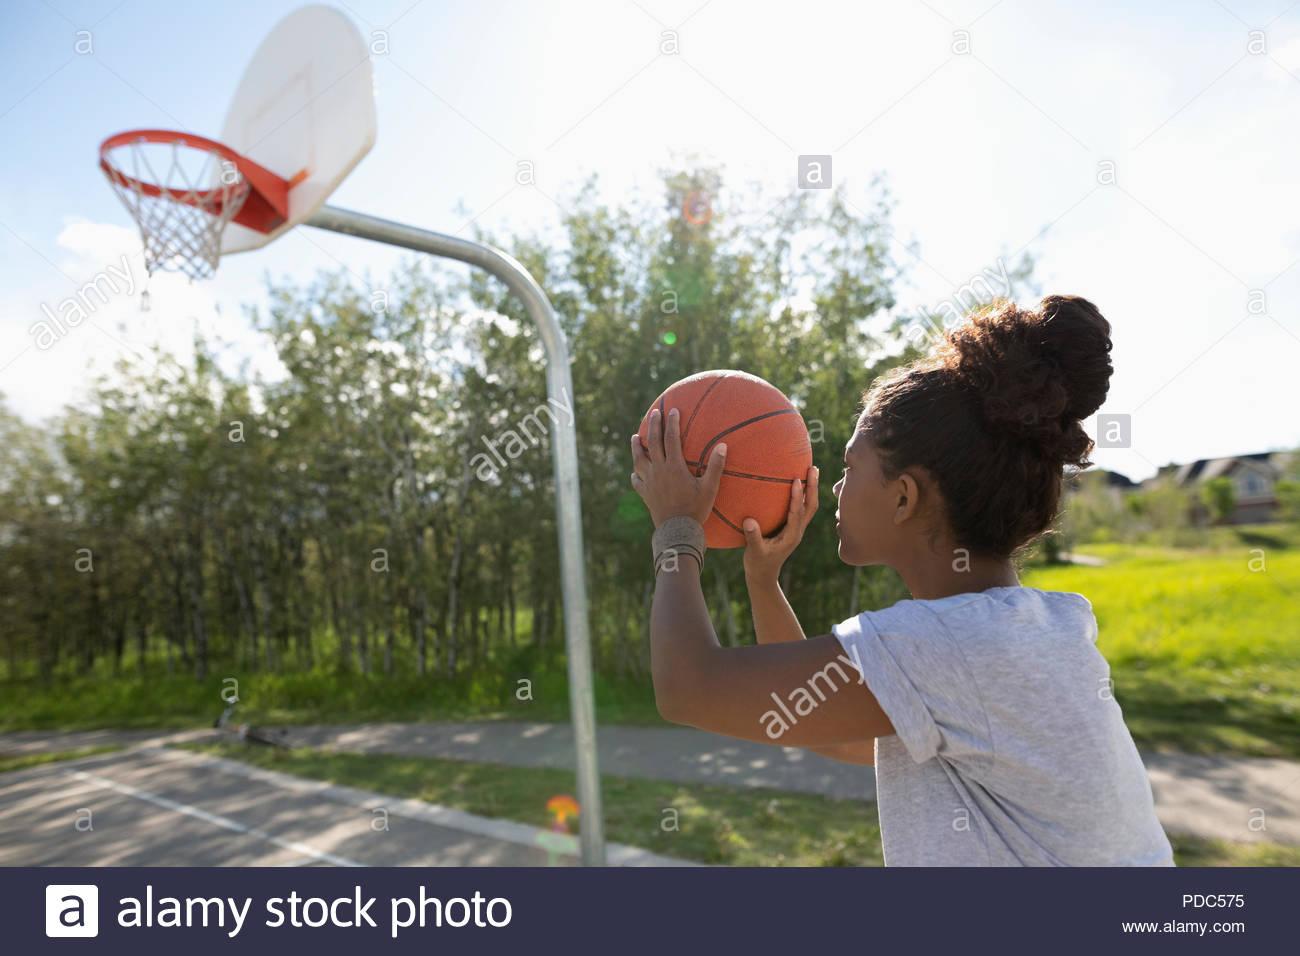 Young woman playing basketball at park basketball court - Stock Image